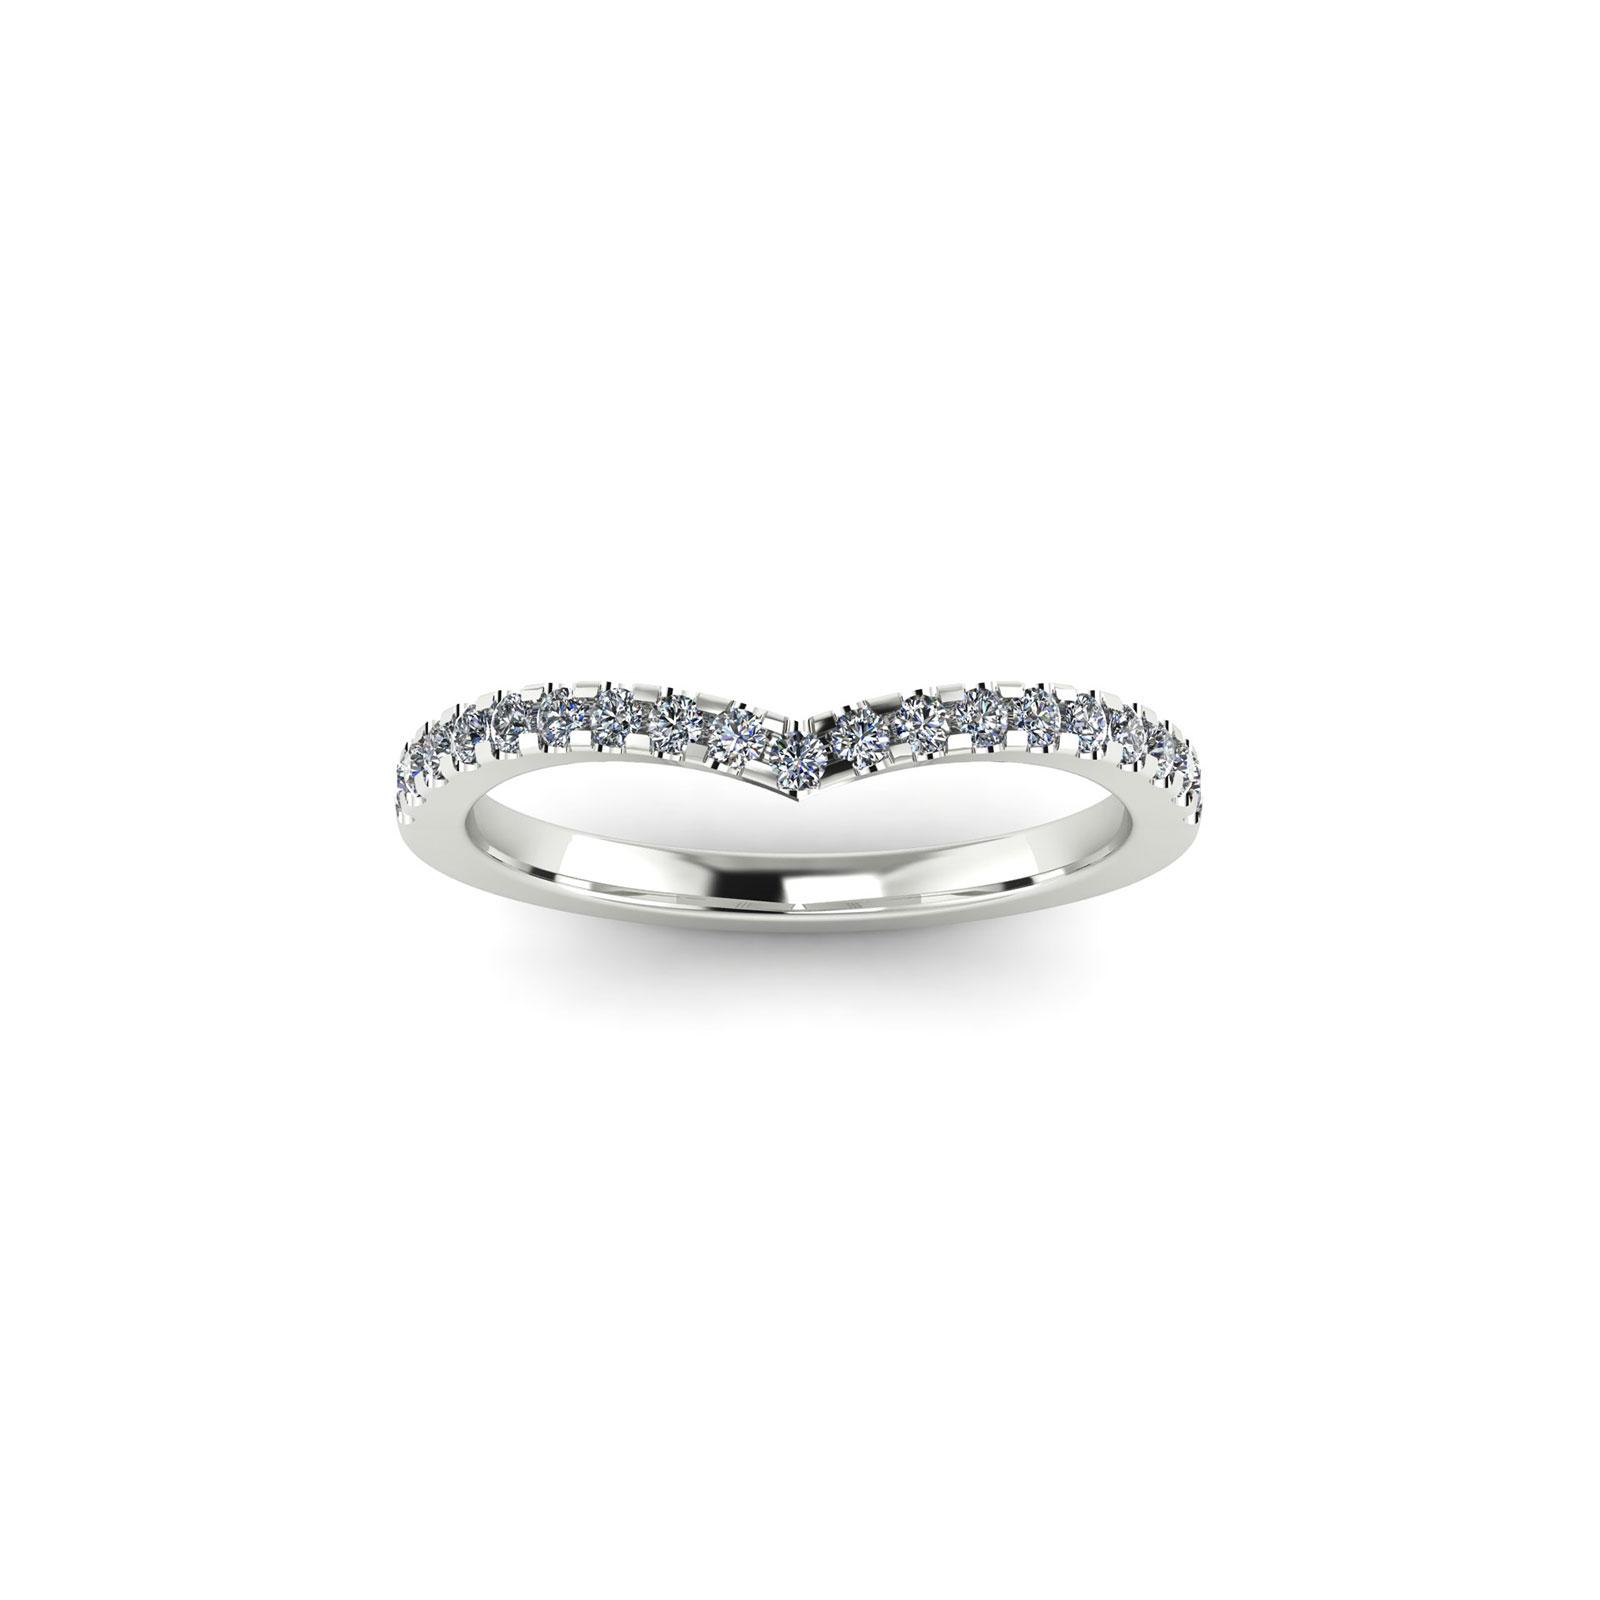 V-Eternity Wedding Band (Top View) - Draco Diamonds